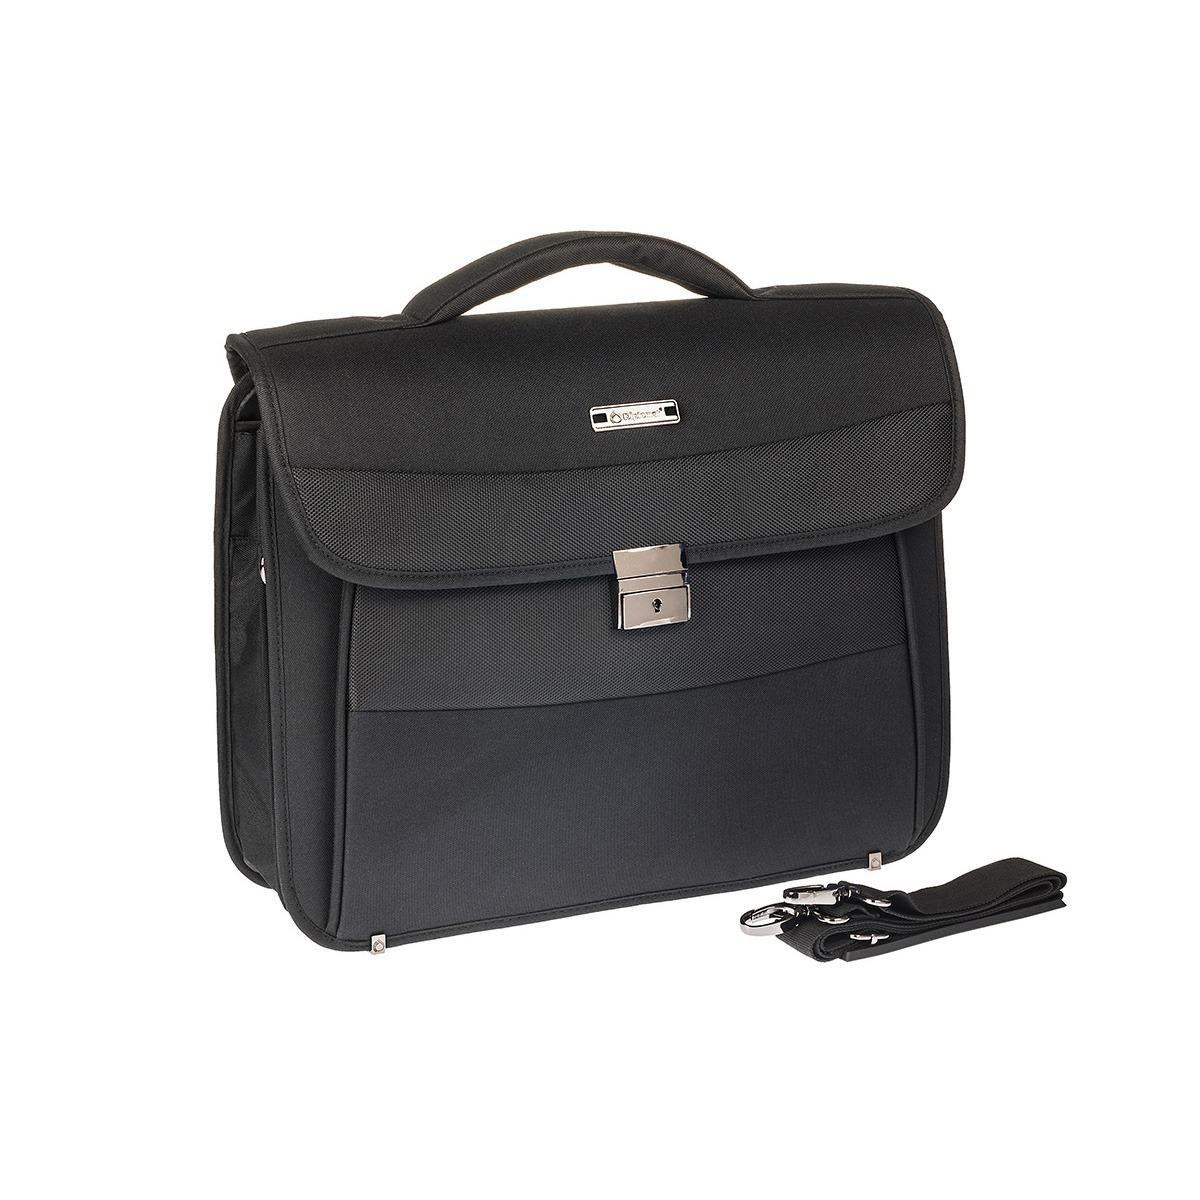 7a88ea5d54 Επαγγελματική Τσάντα Διθέσια – Χαρτοφύλακας Laptop 15.6″ Diplomat 33cm  BL212 Μαύρη